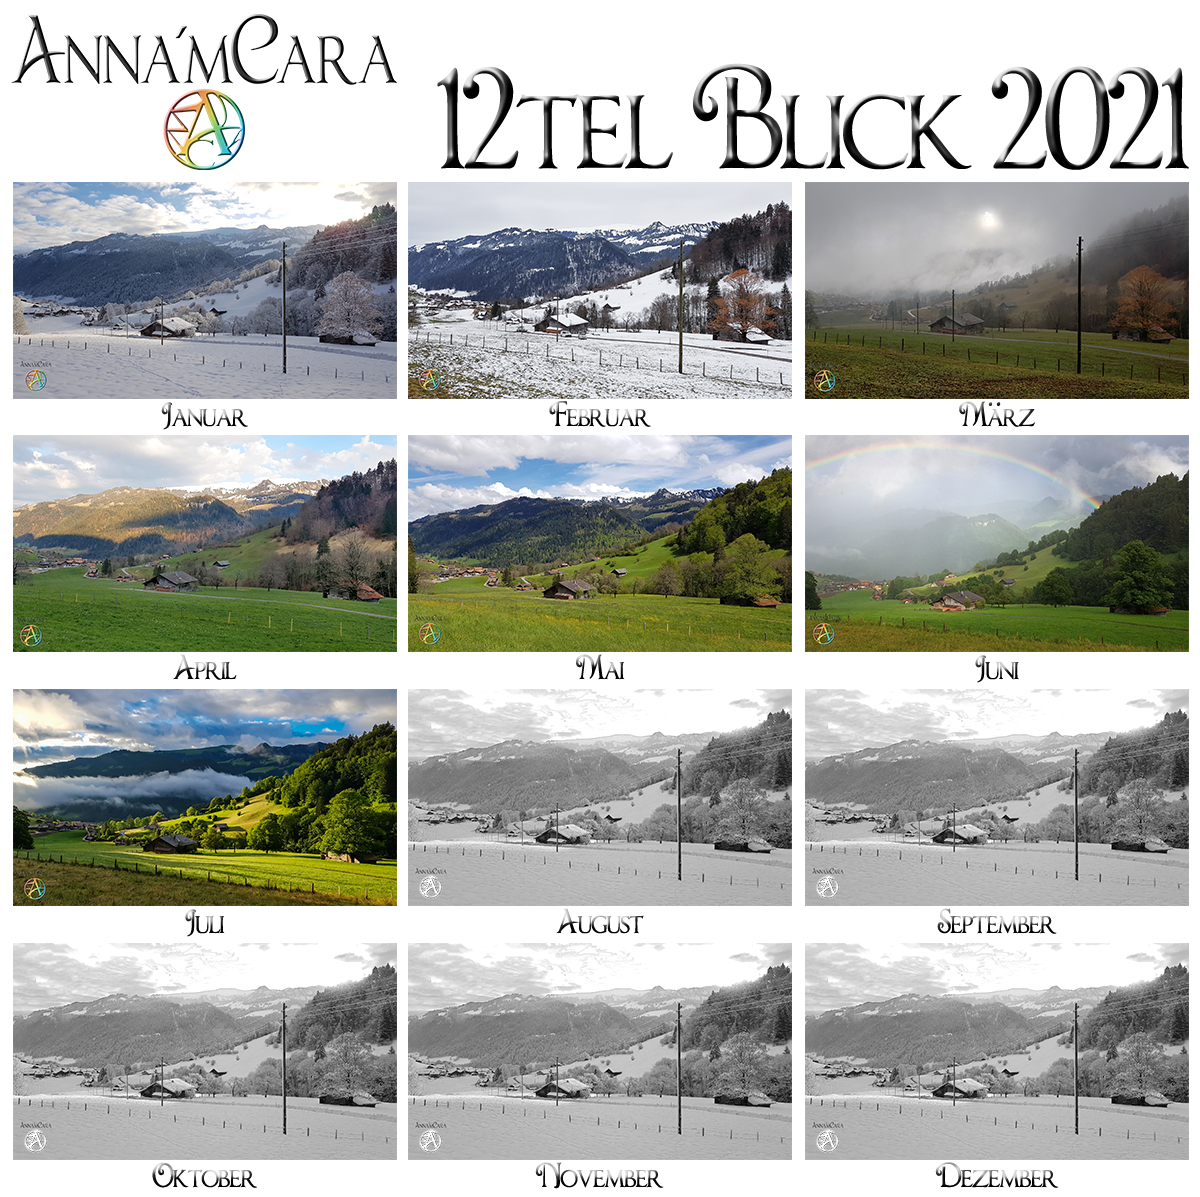 Anna'mCara-Blog - 12tel-Blick - Jahresblick - Juli